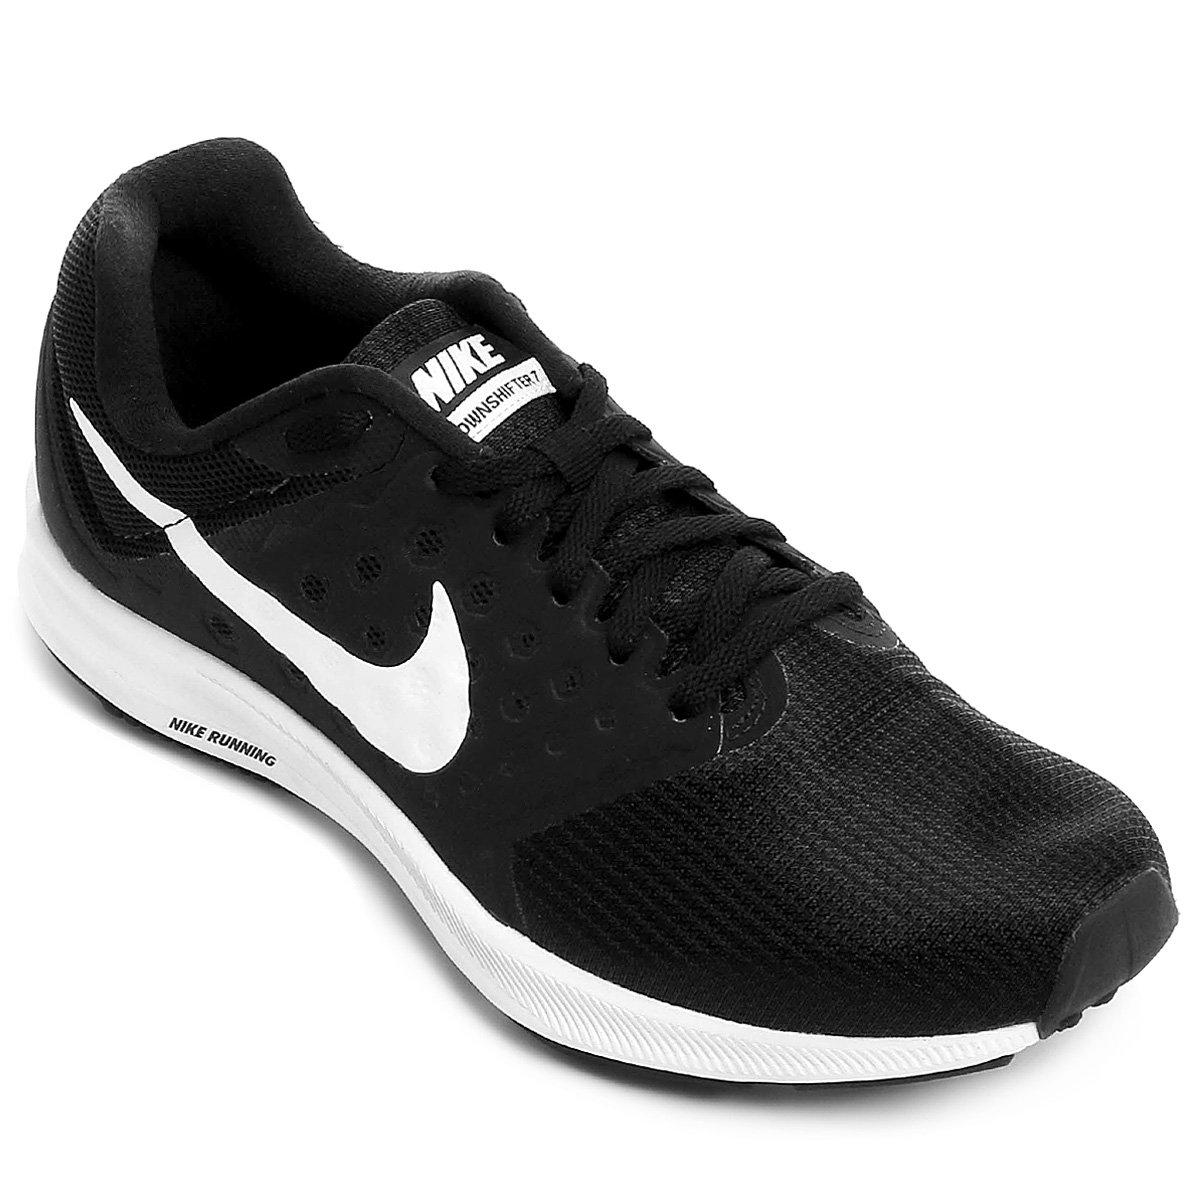 fd546bb477 Tênis Nike Downshifter 7 Feminino - Preto e Branco - Compre Agora ...